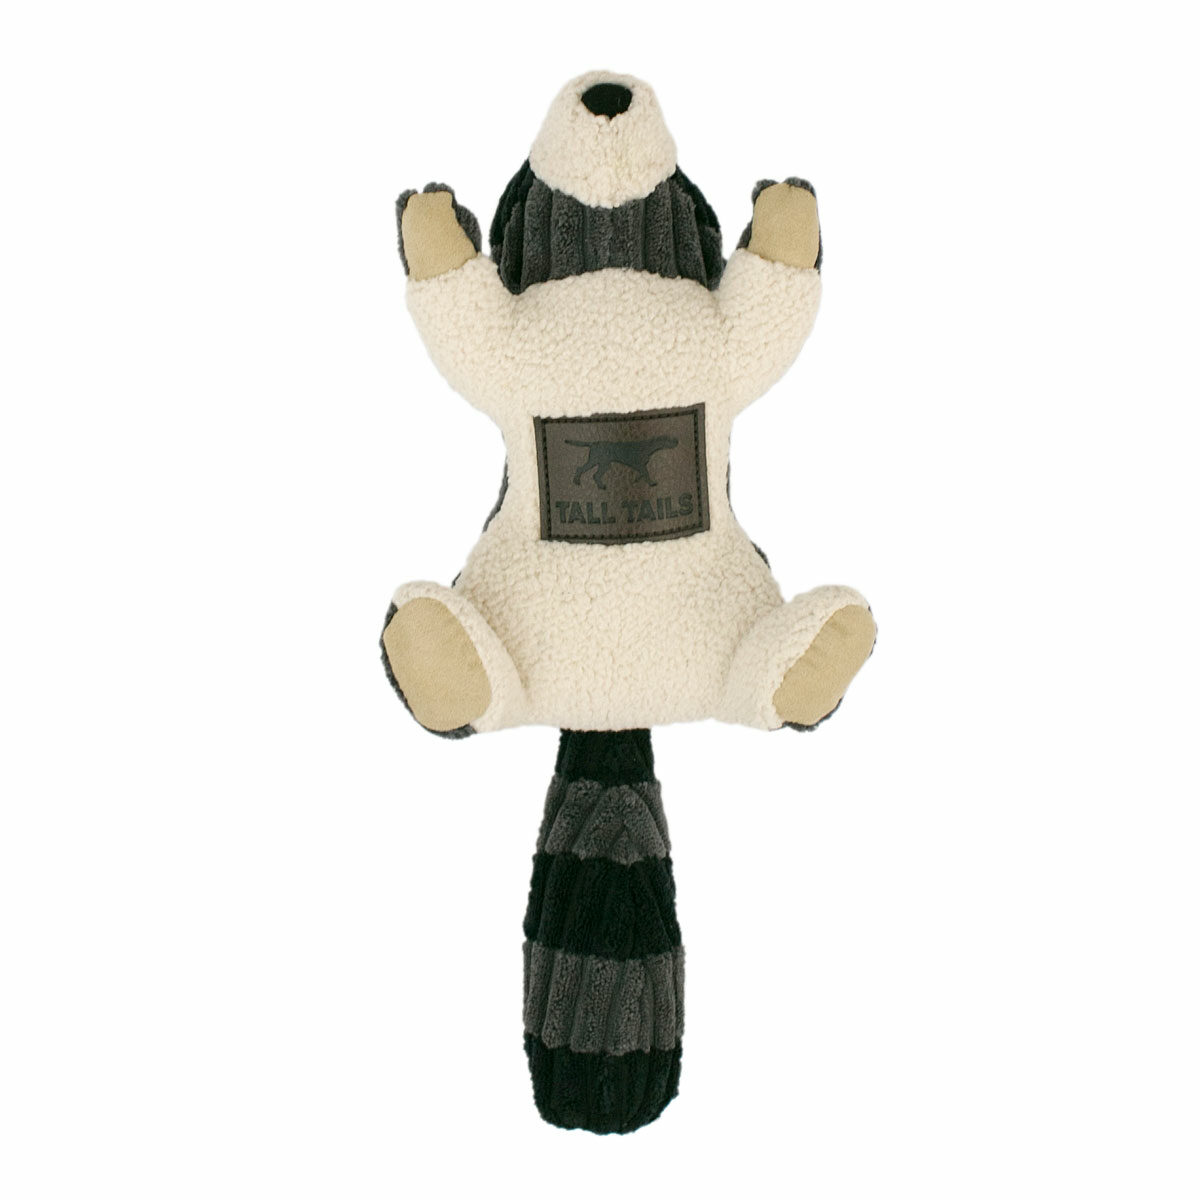 Tall Tails Plush Raccoon Dog Toy